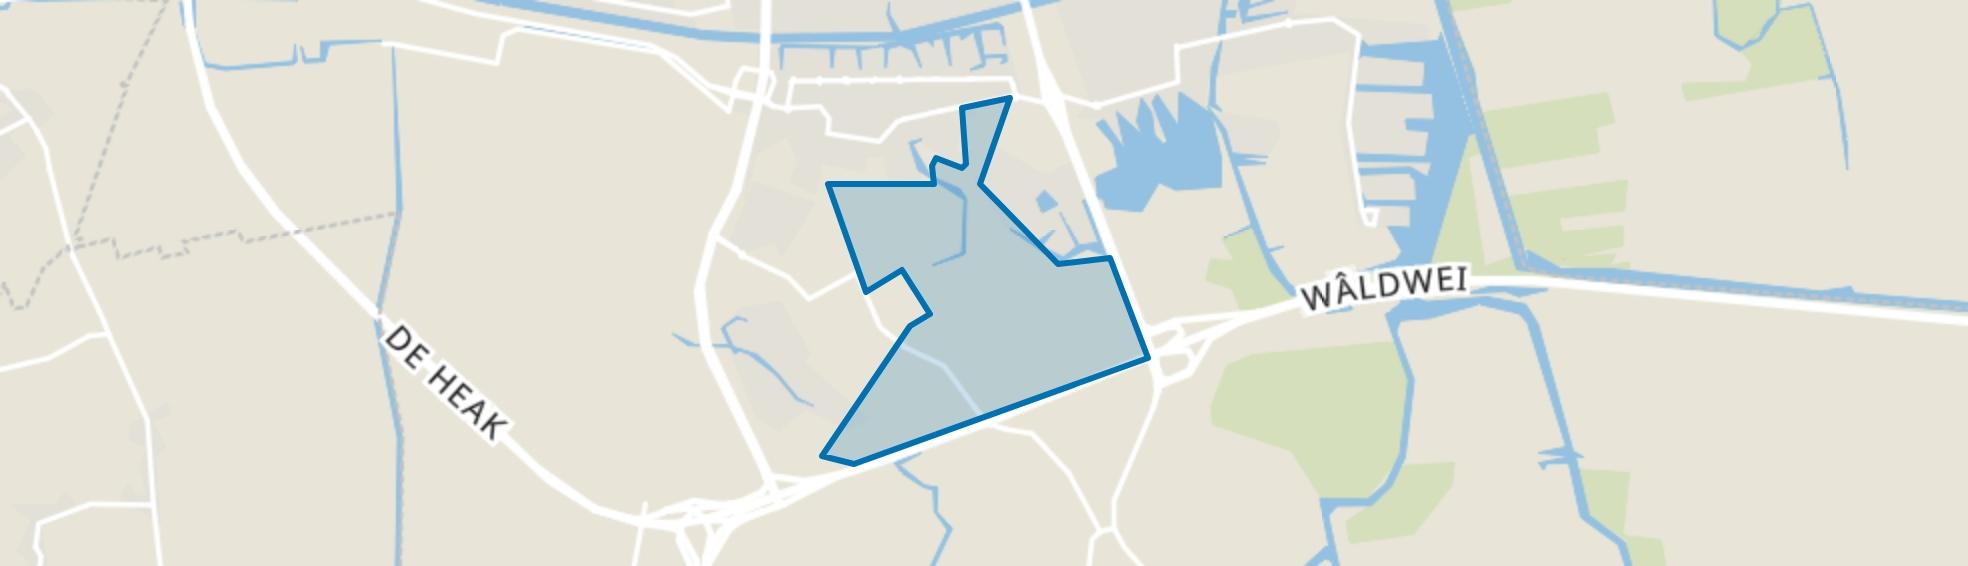 De Zuidlanden, Leeuwarden map